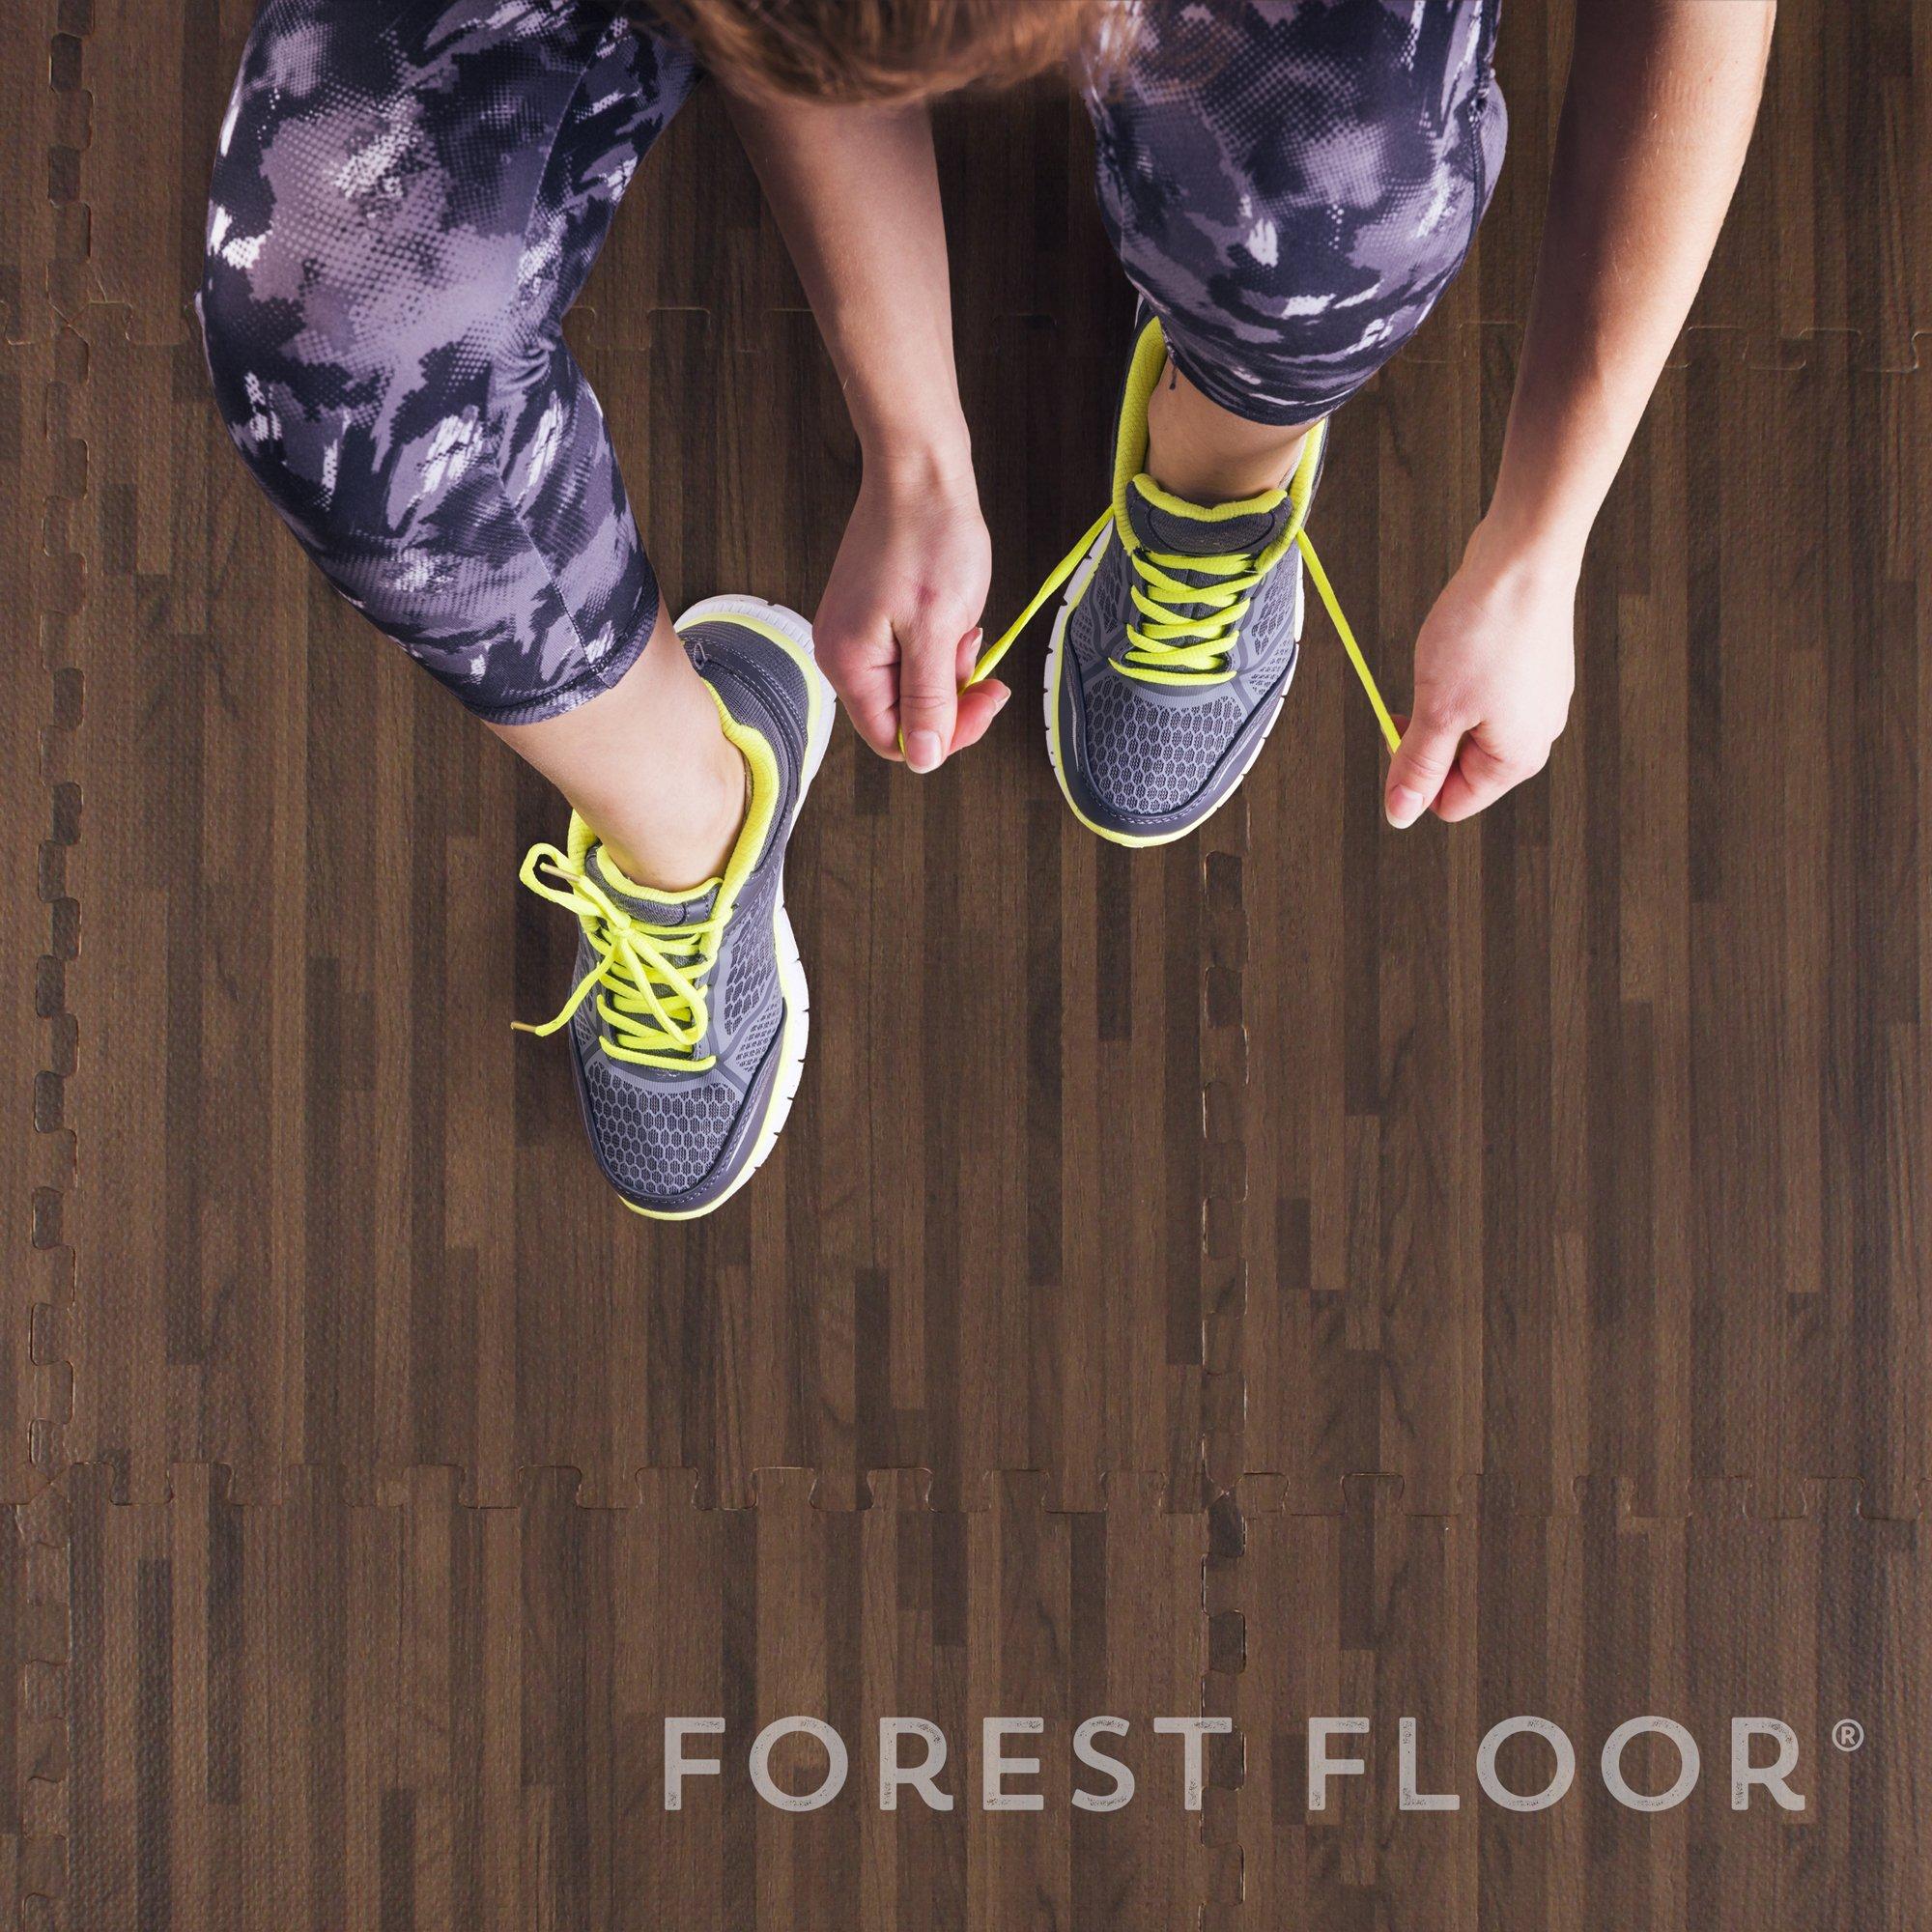 Forest Floor 3/8'' Thick Printed Wood Grain Interlocking Foam Floor Mats, 16 Sq Ft (4 Tiles), Walnut by Forest Floor (Image #6)